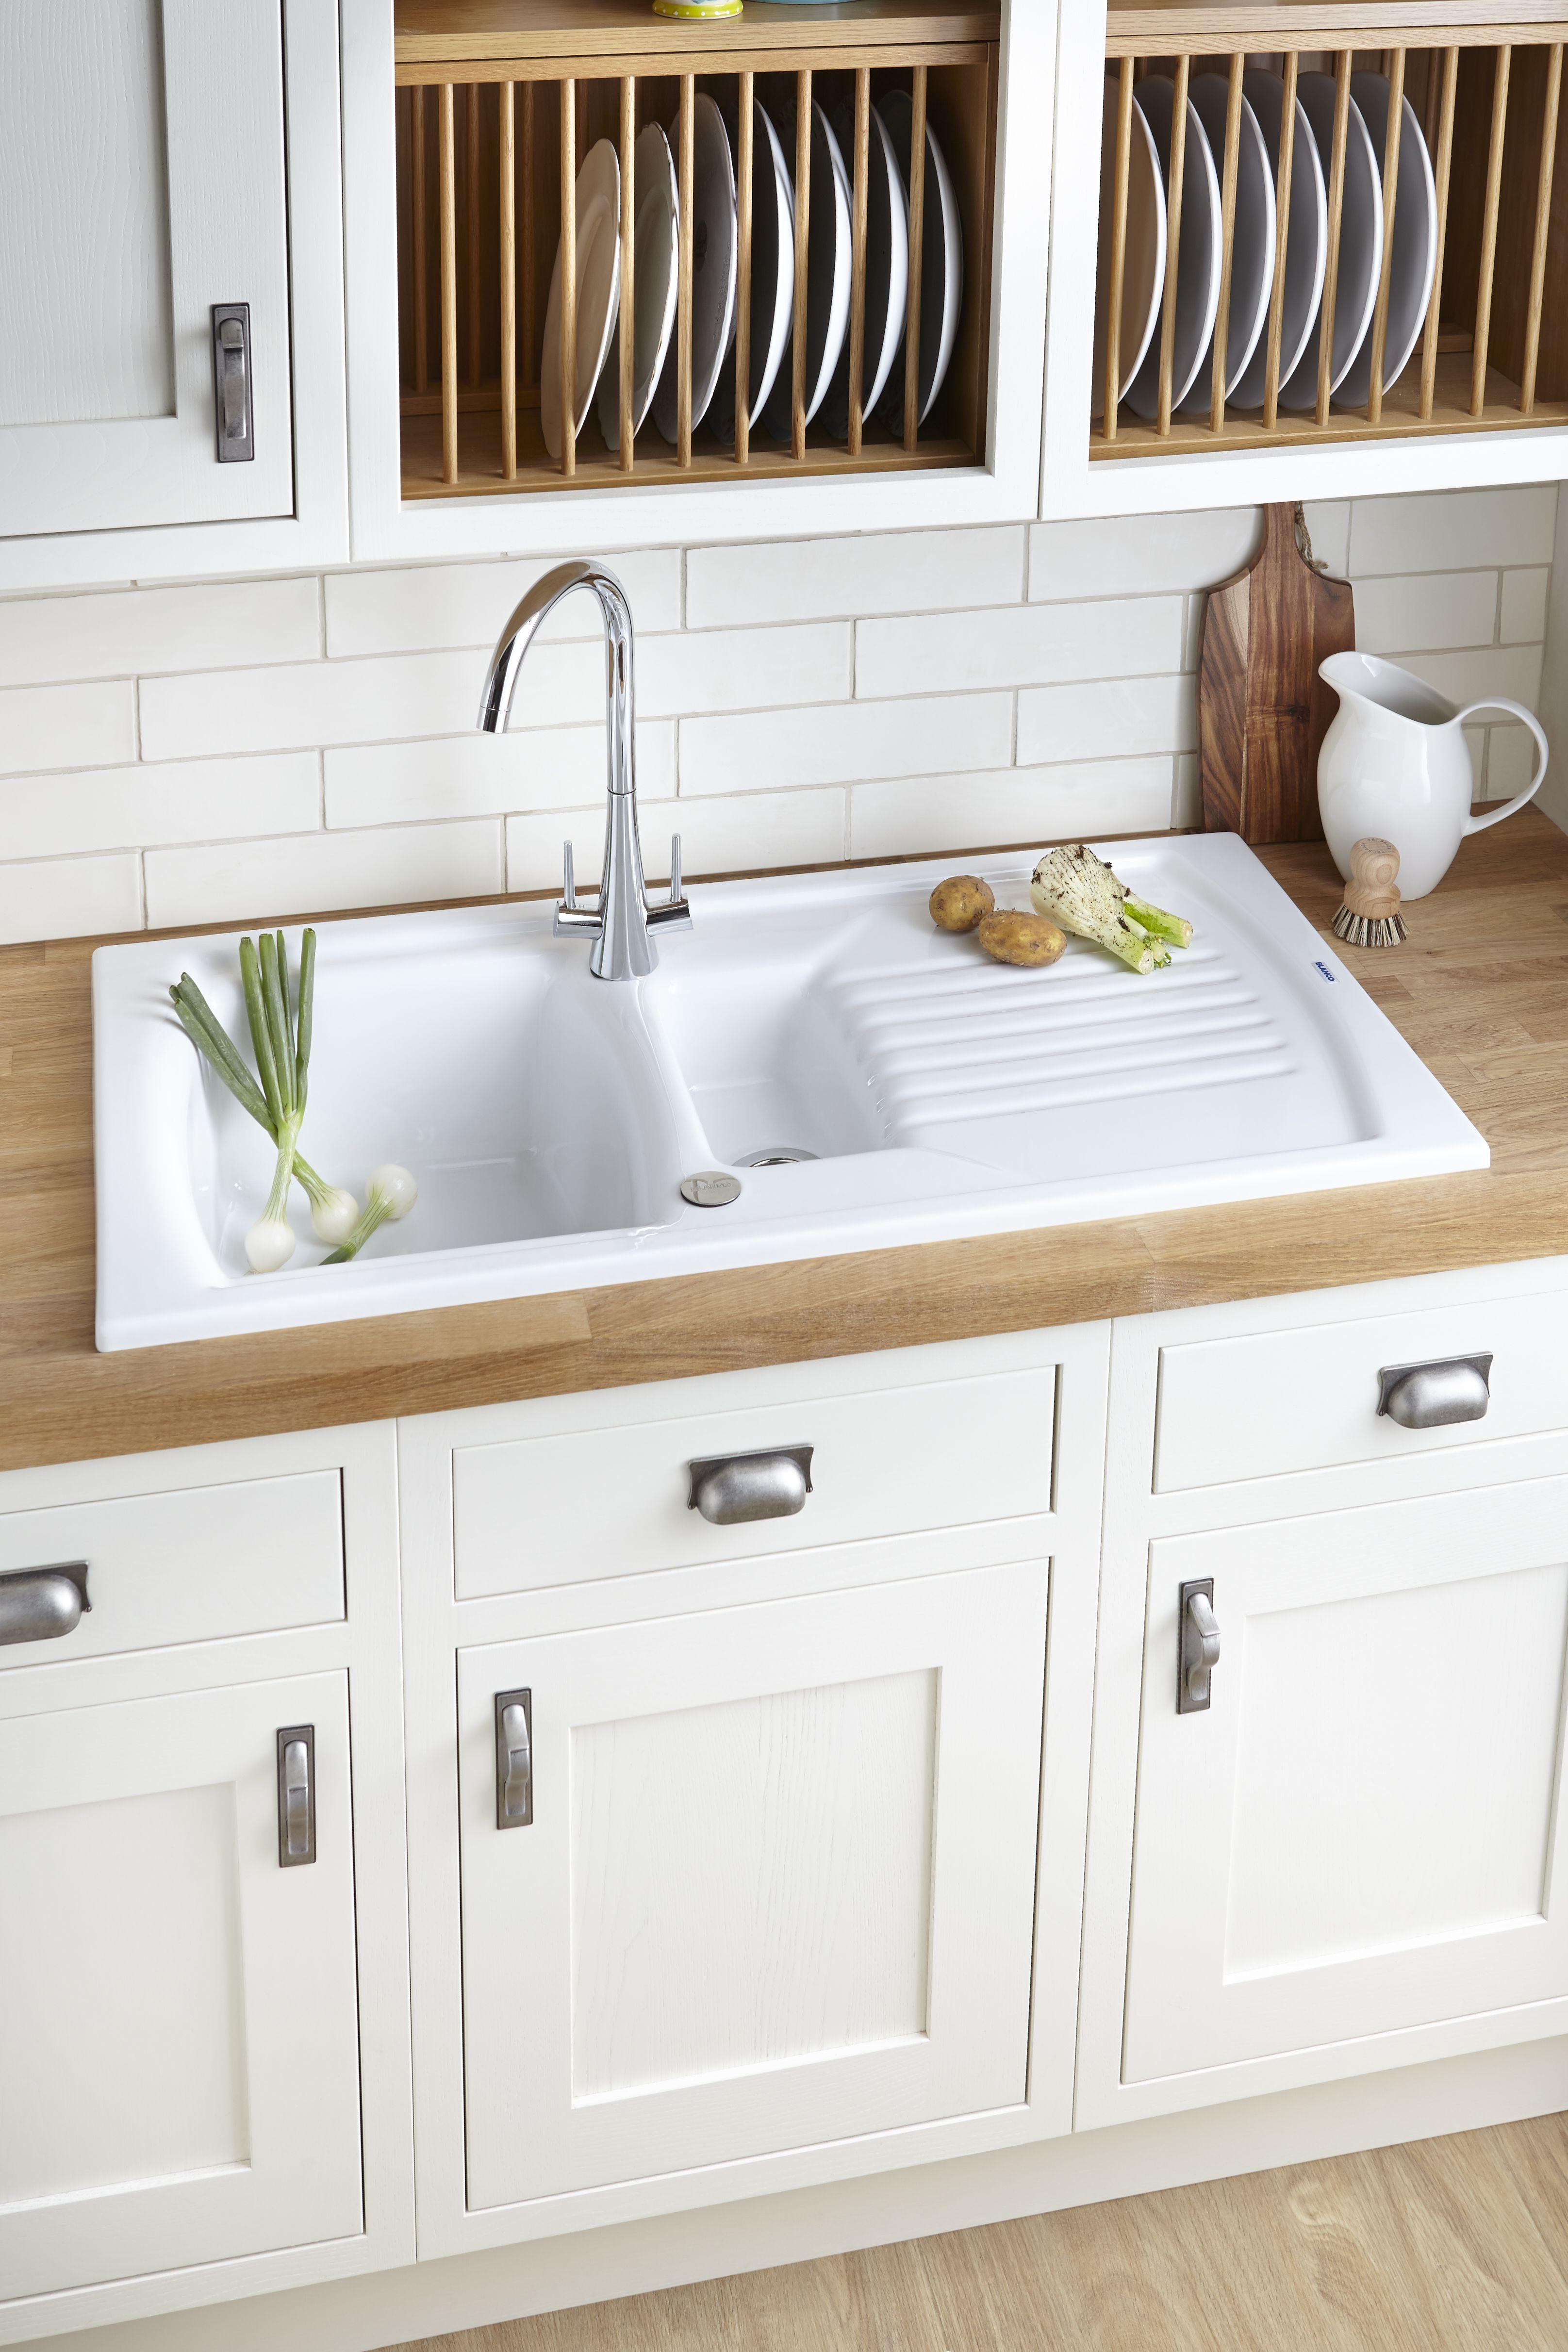 Kitchen sink buying guide Ideas